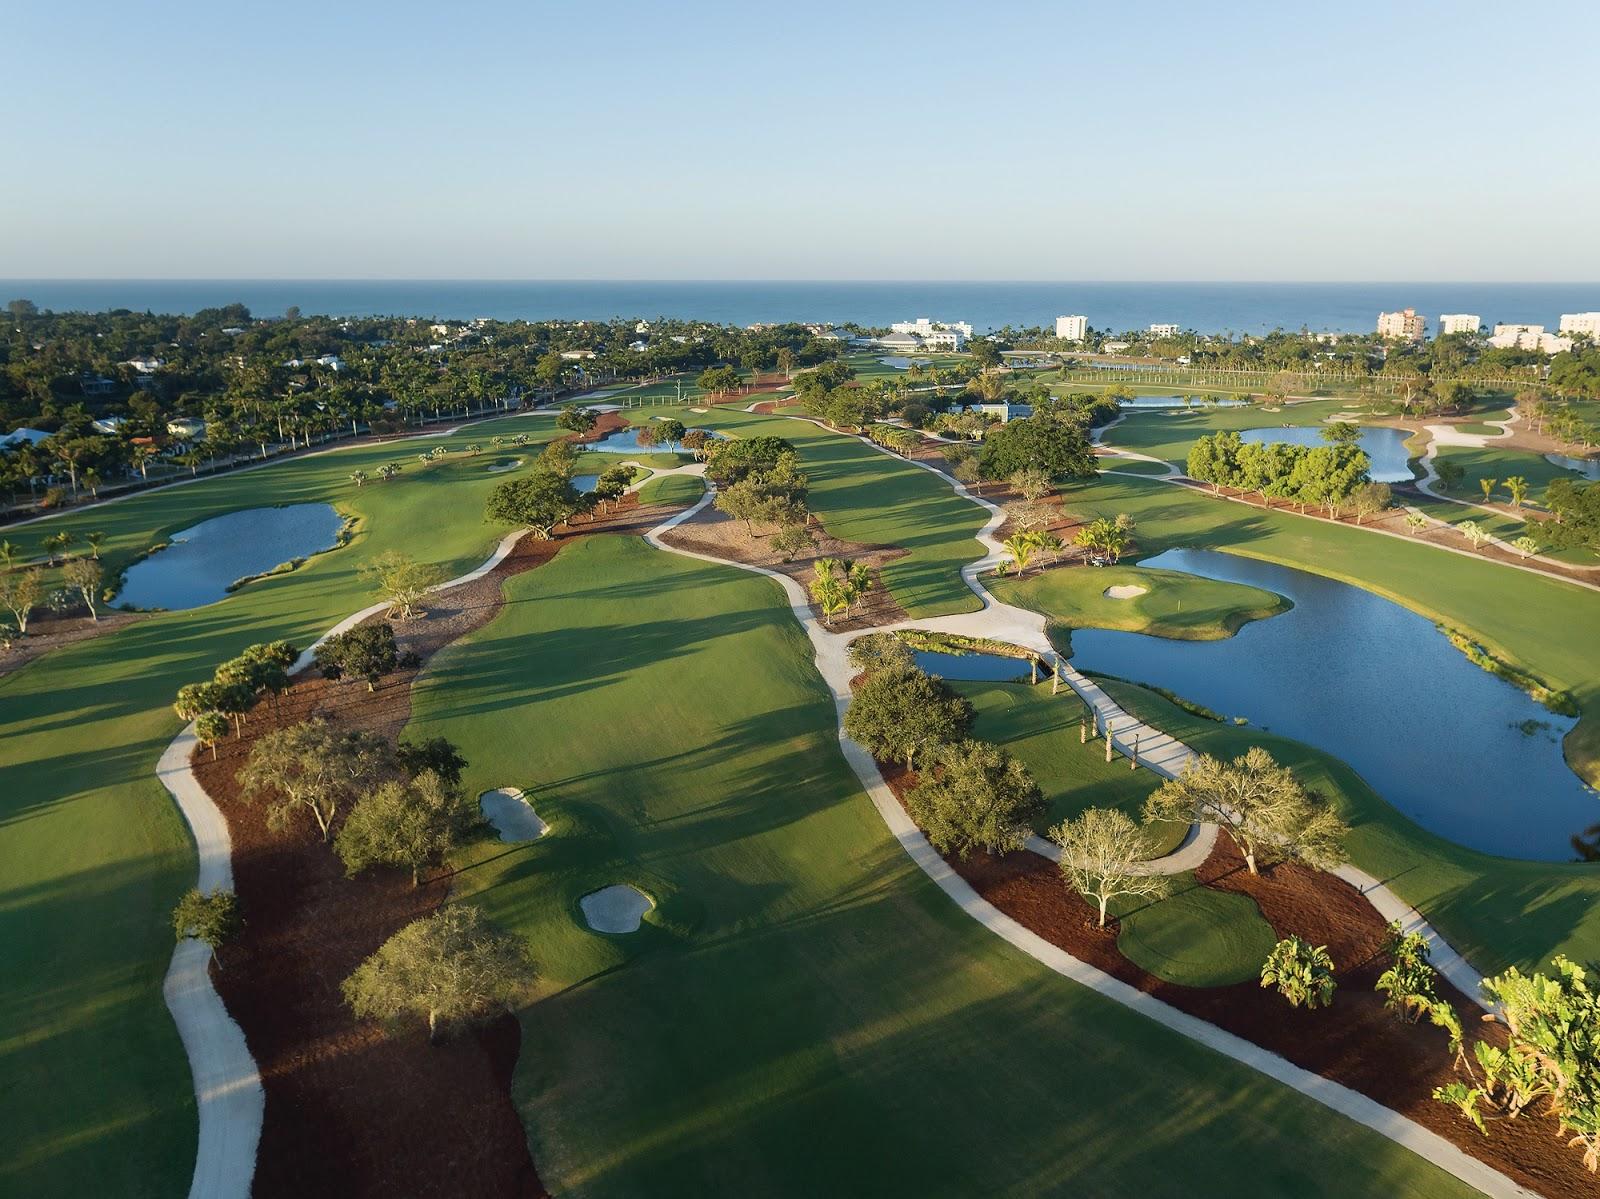 Aaa Naples Fl >> American Golfer The Aaa Four Diamond The Naples Beach Hotel Golf